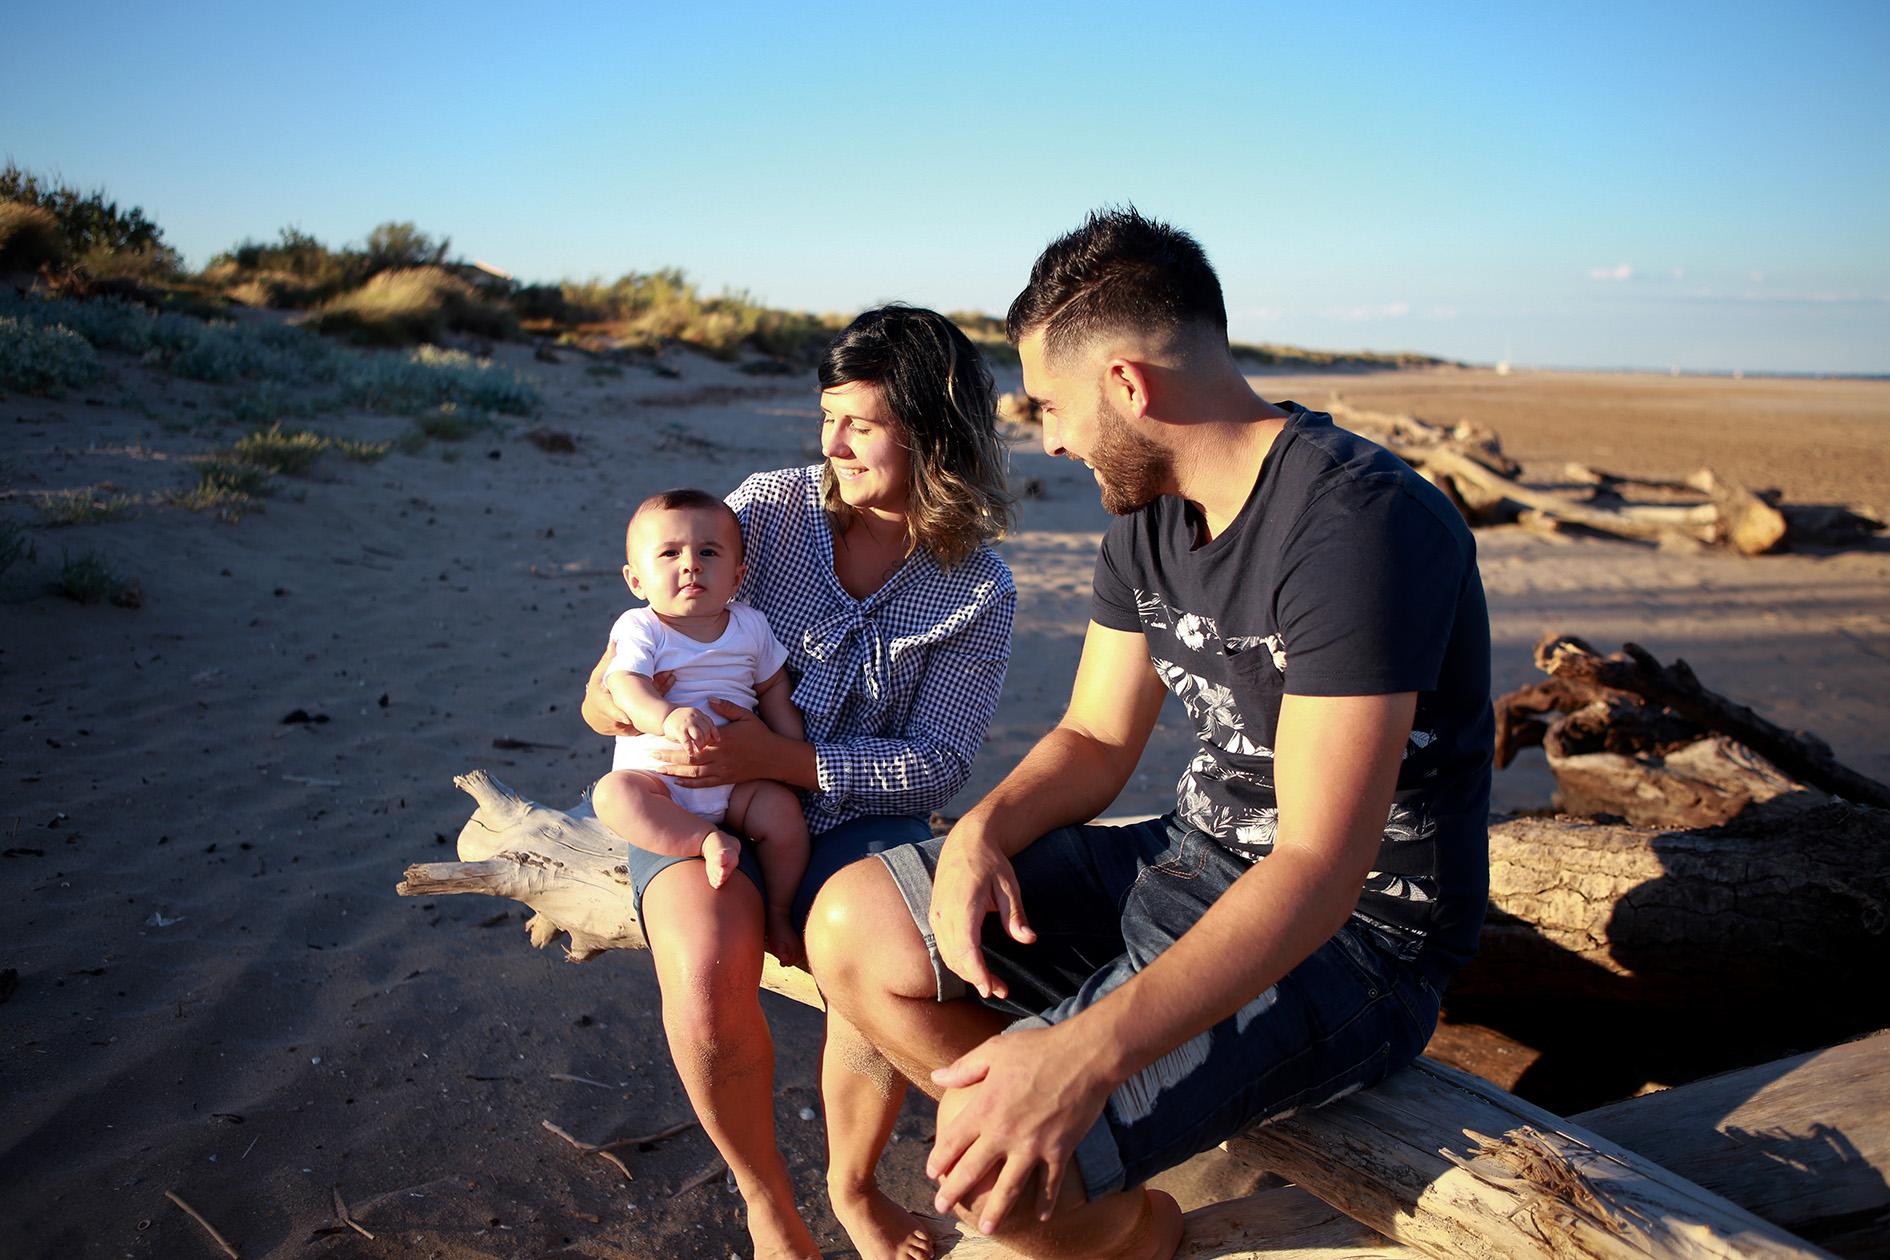 photographe-famille-bebe-plage-ameliecorneille-valras-serignan-herault